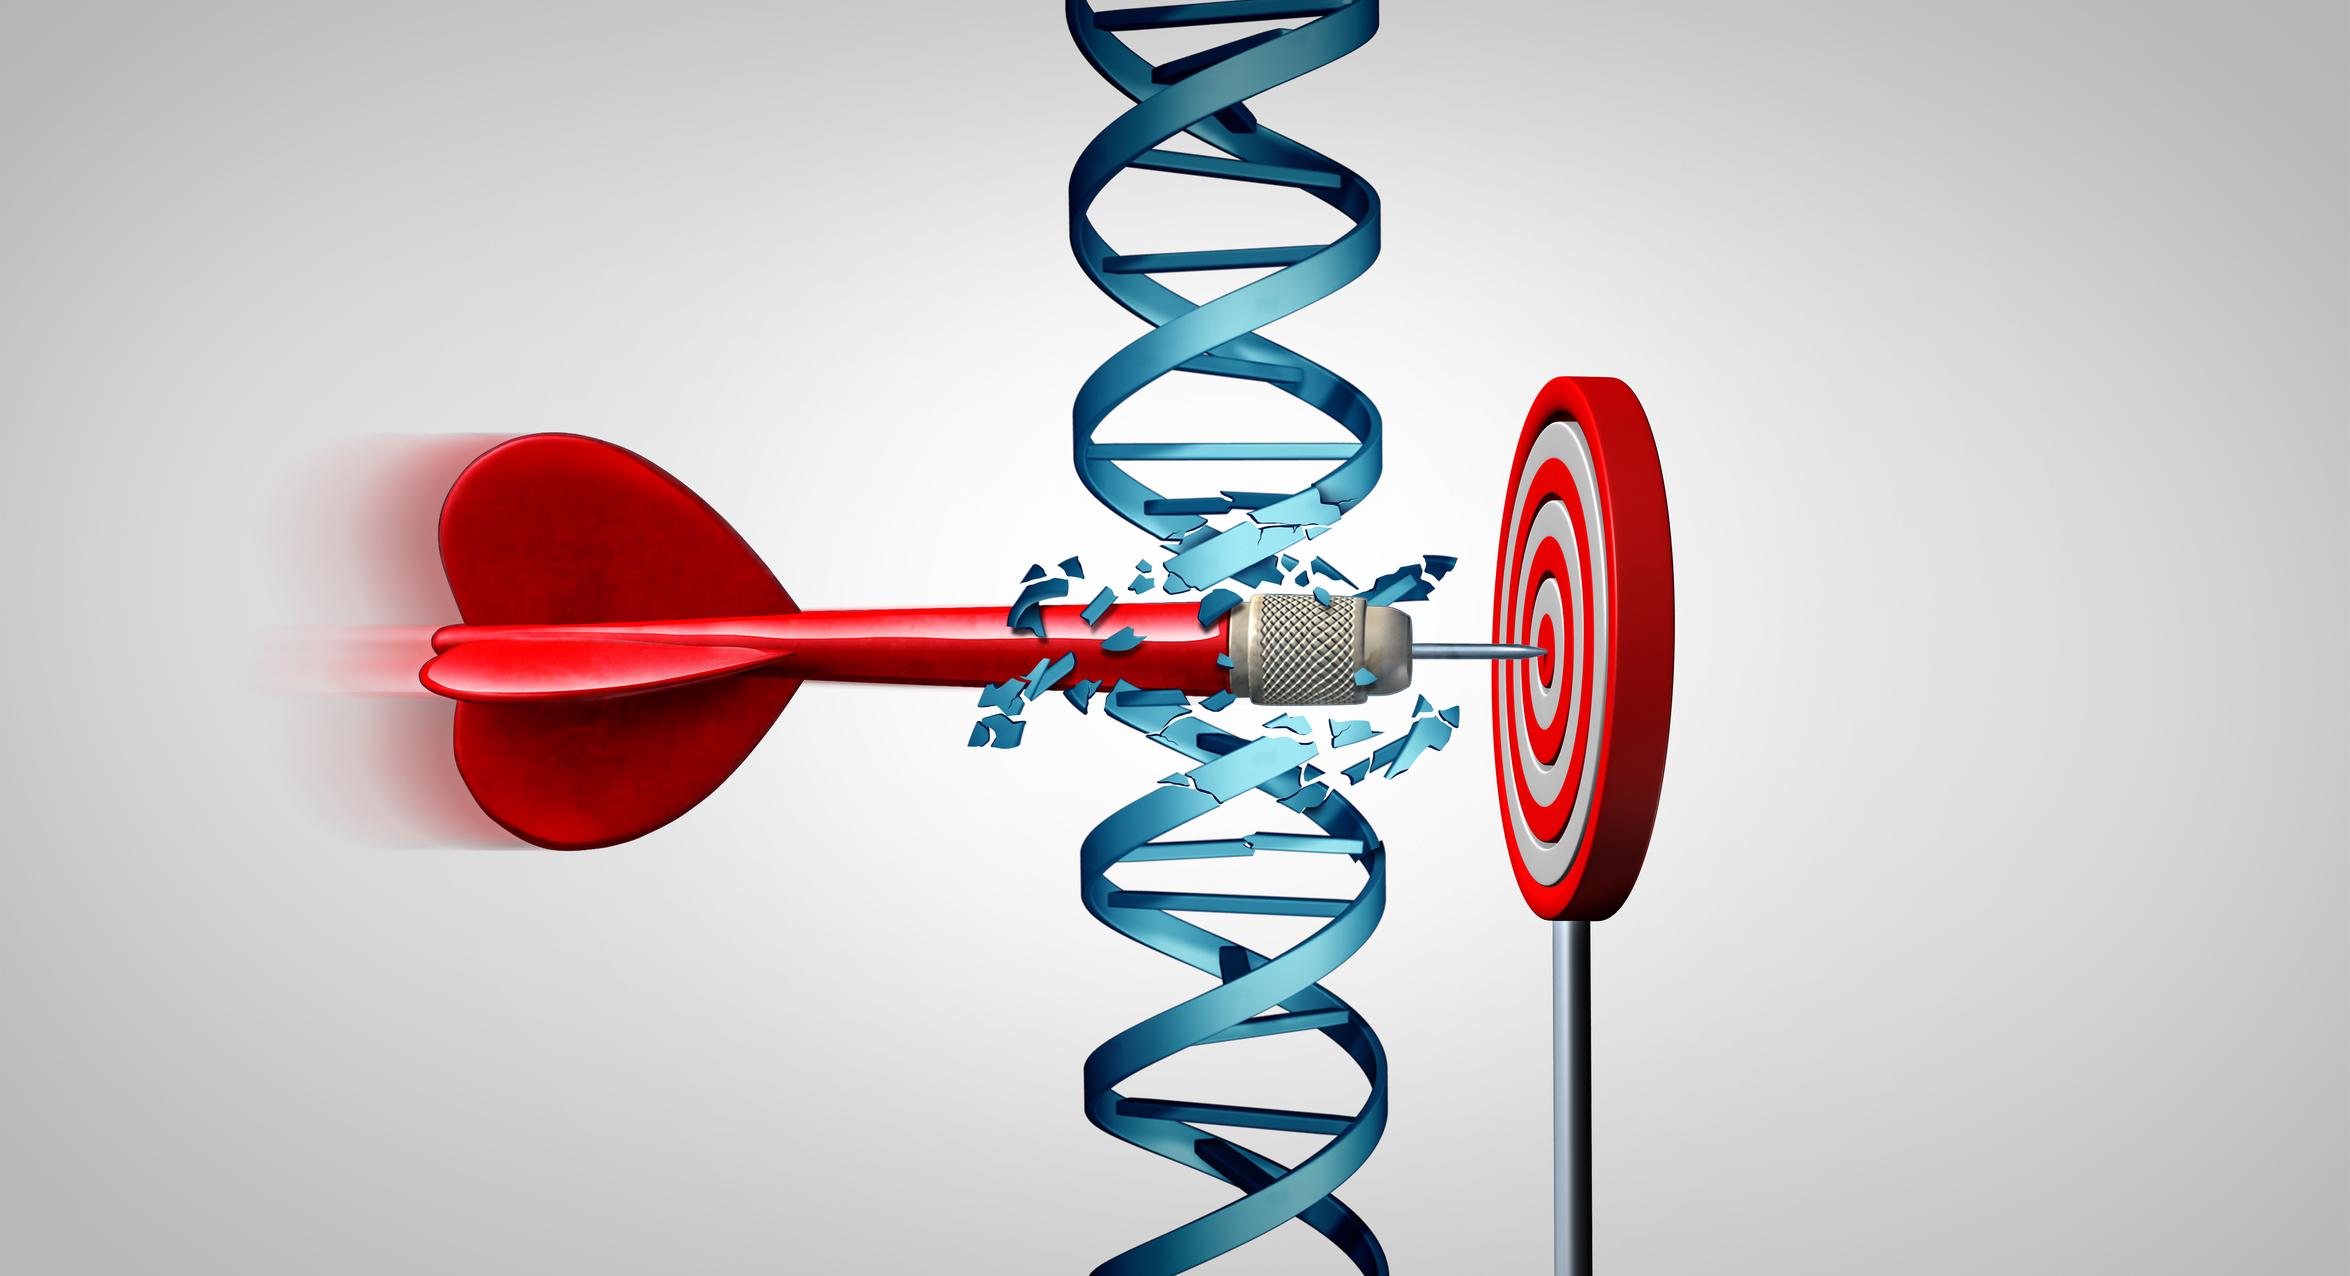 Dart shattering DNA strand to hit target